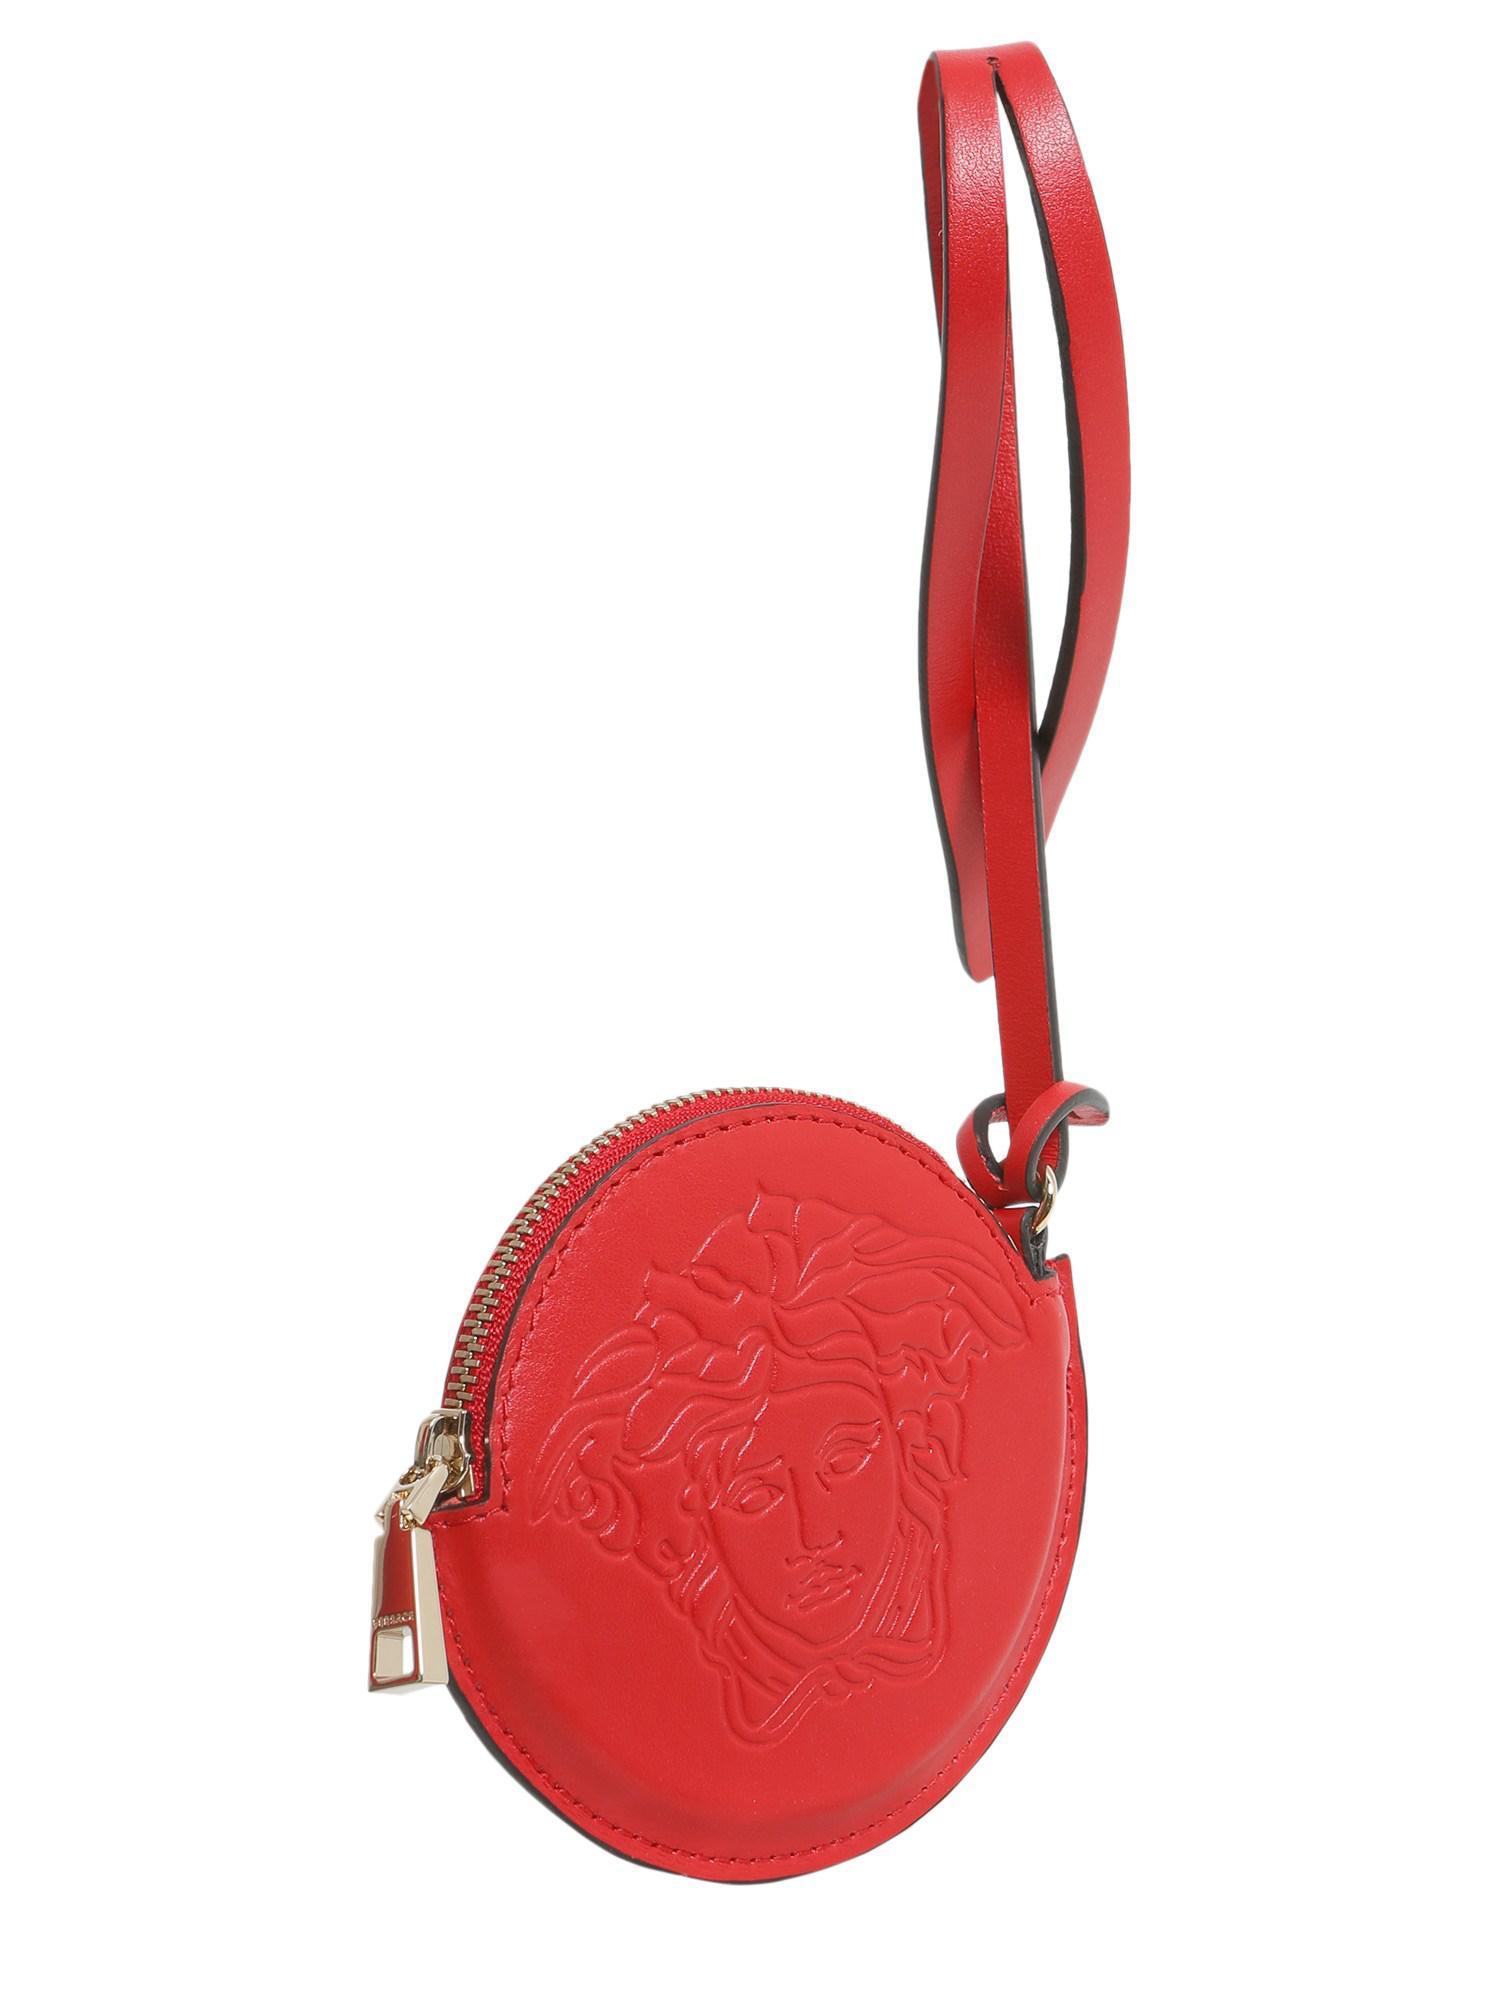 955249246cae Versace - Red Leather Medusa Head Charm - Lyst. View fullscreen